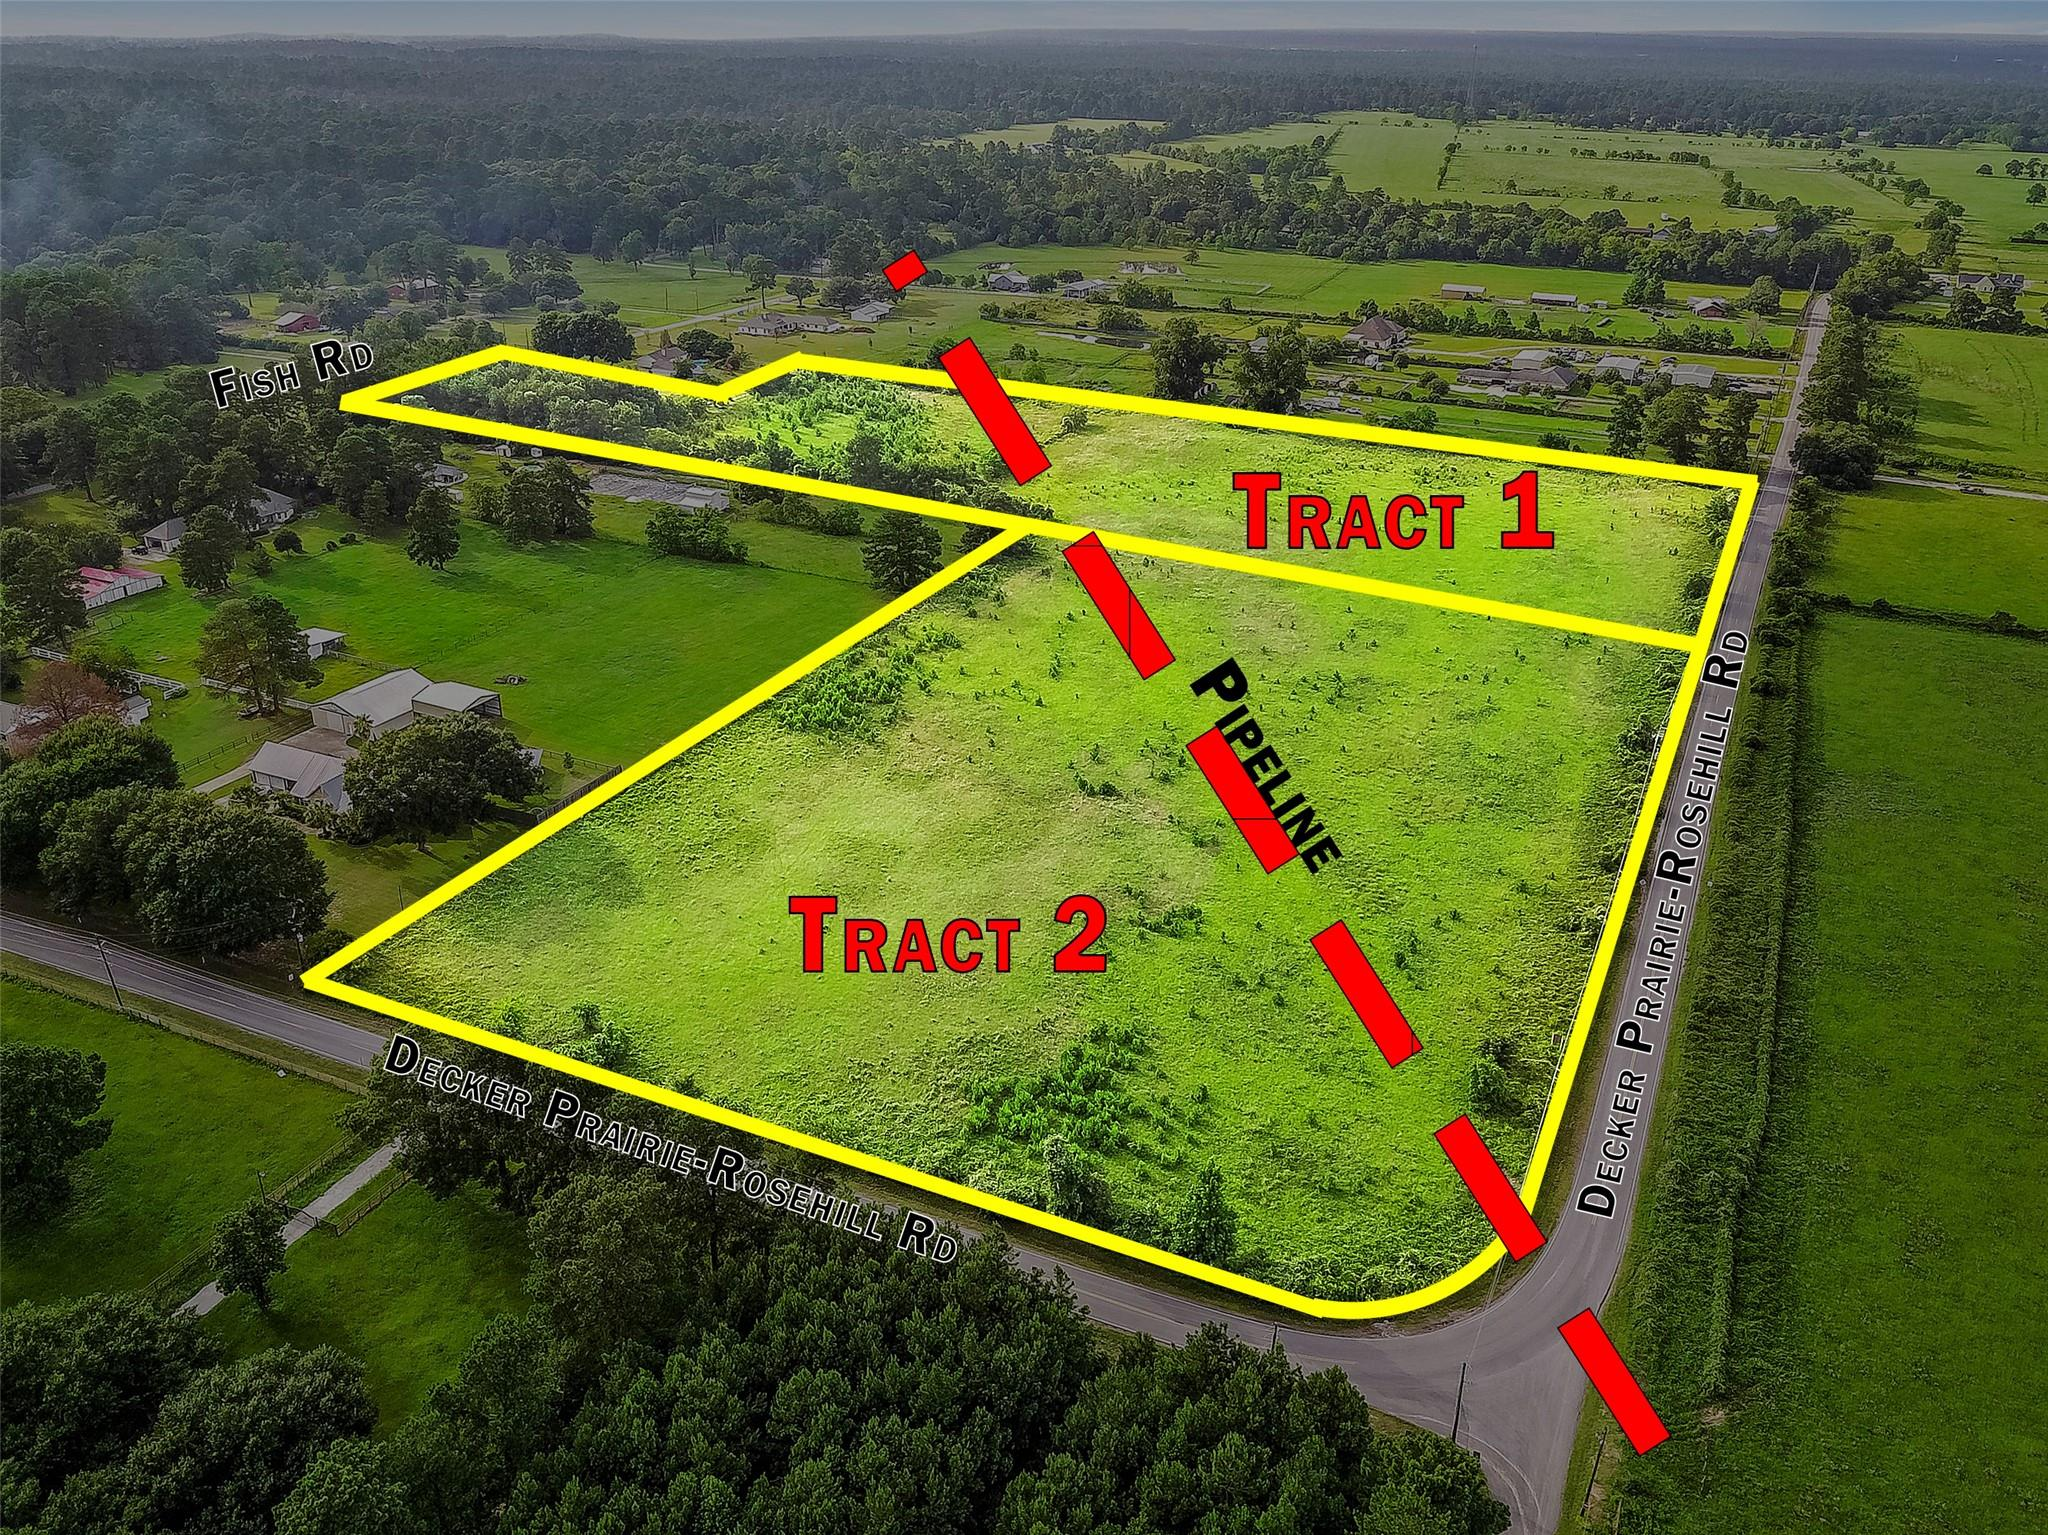 A0290 James Thomas, Tract 2v 1, Acres 18 Real Estate Listings Main Image